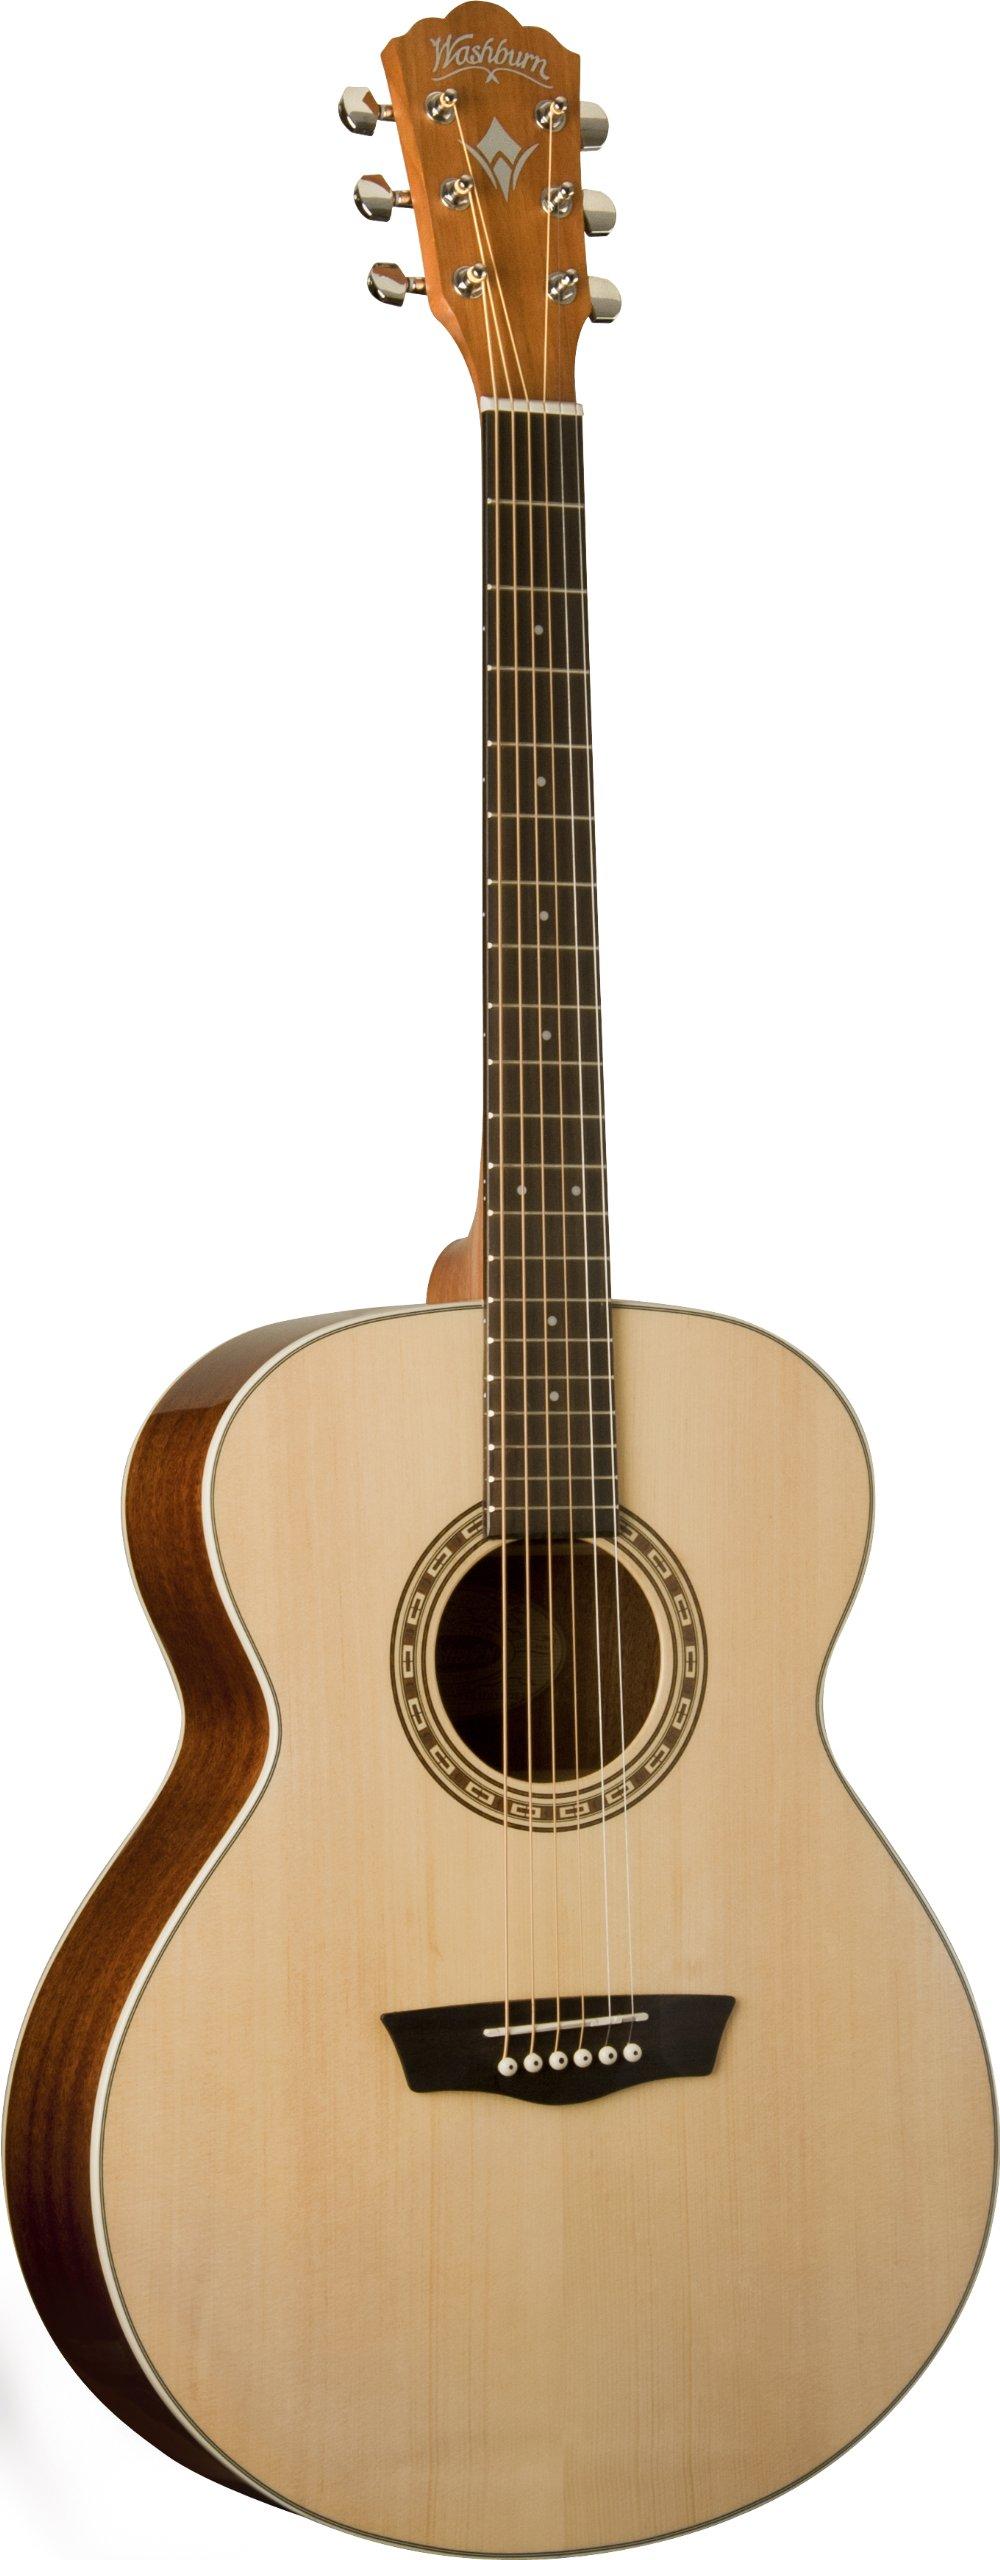 Washburn Harvest Series WG7S Acoustic Guitar, Natural Gloss by Washburn